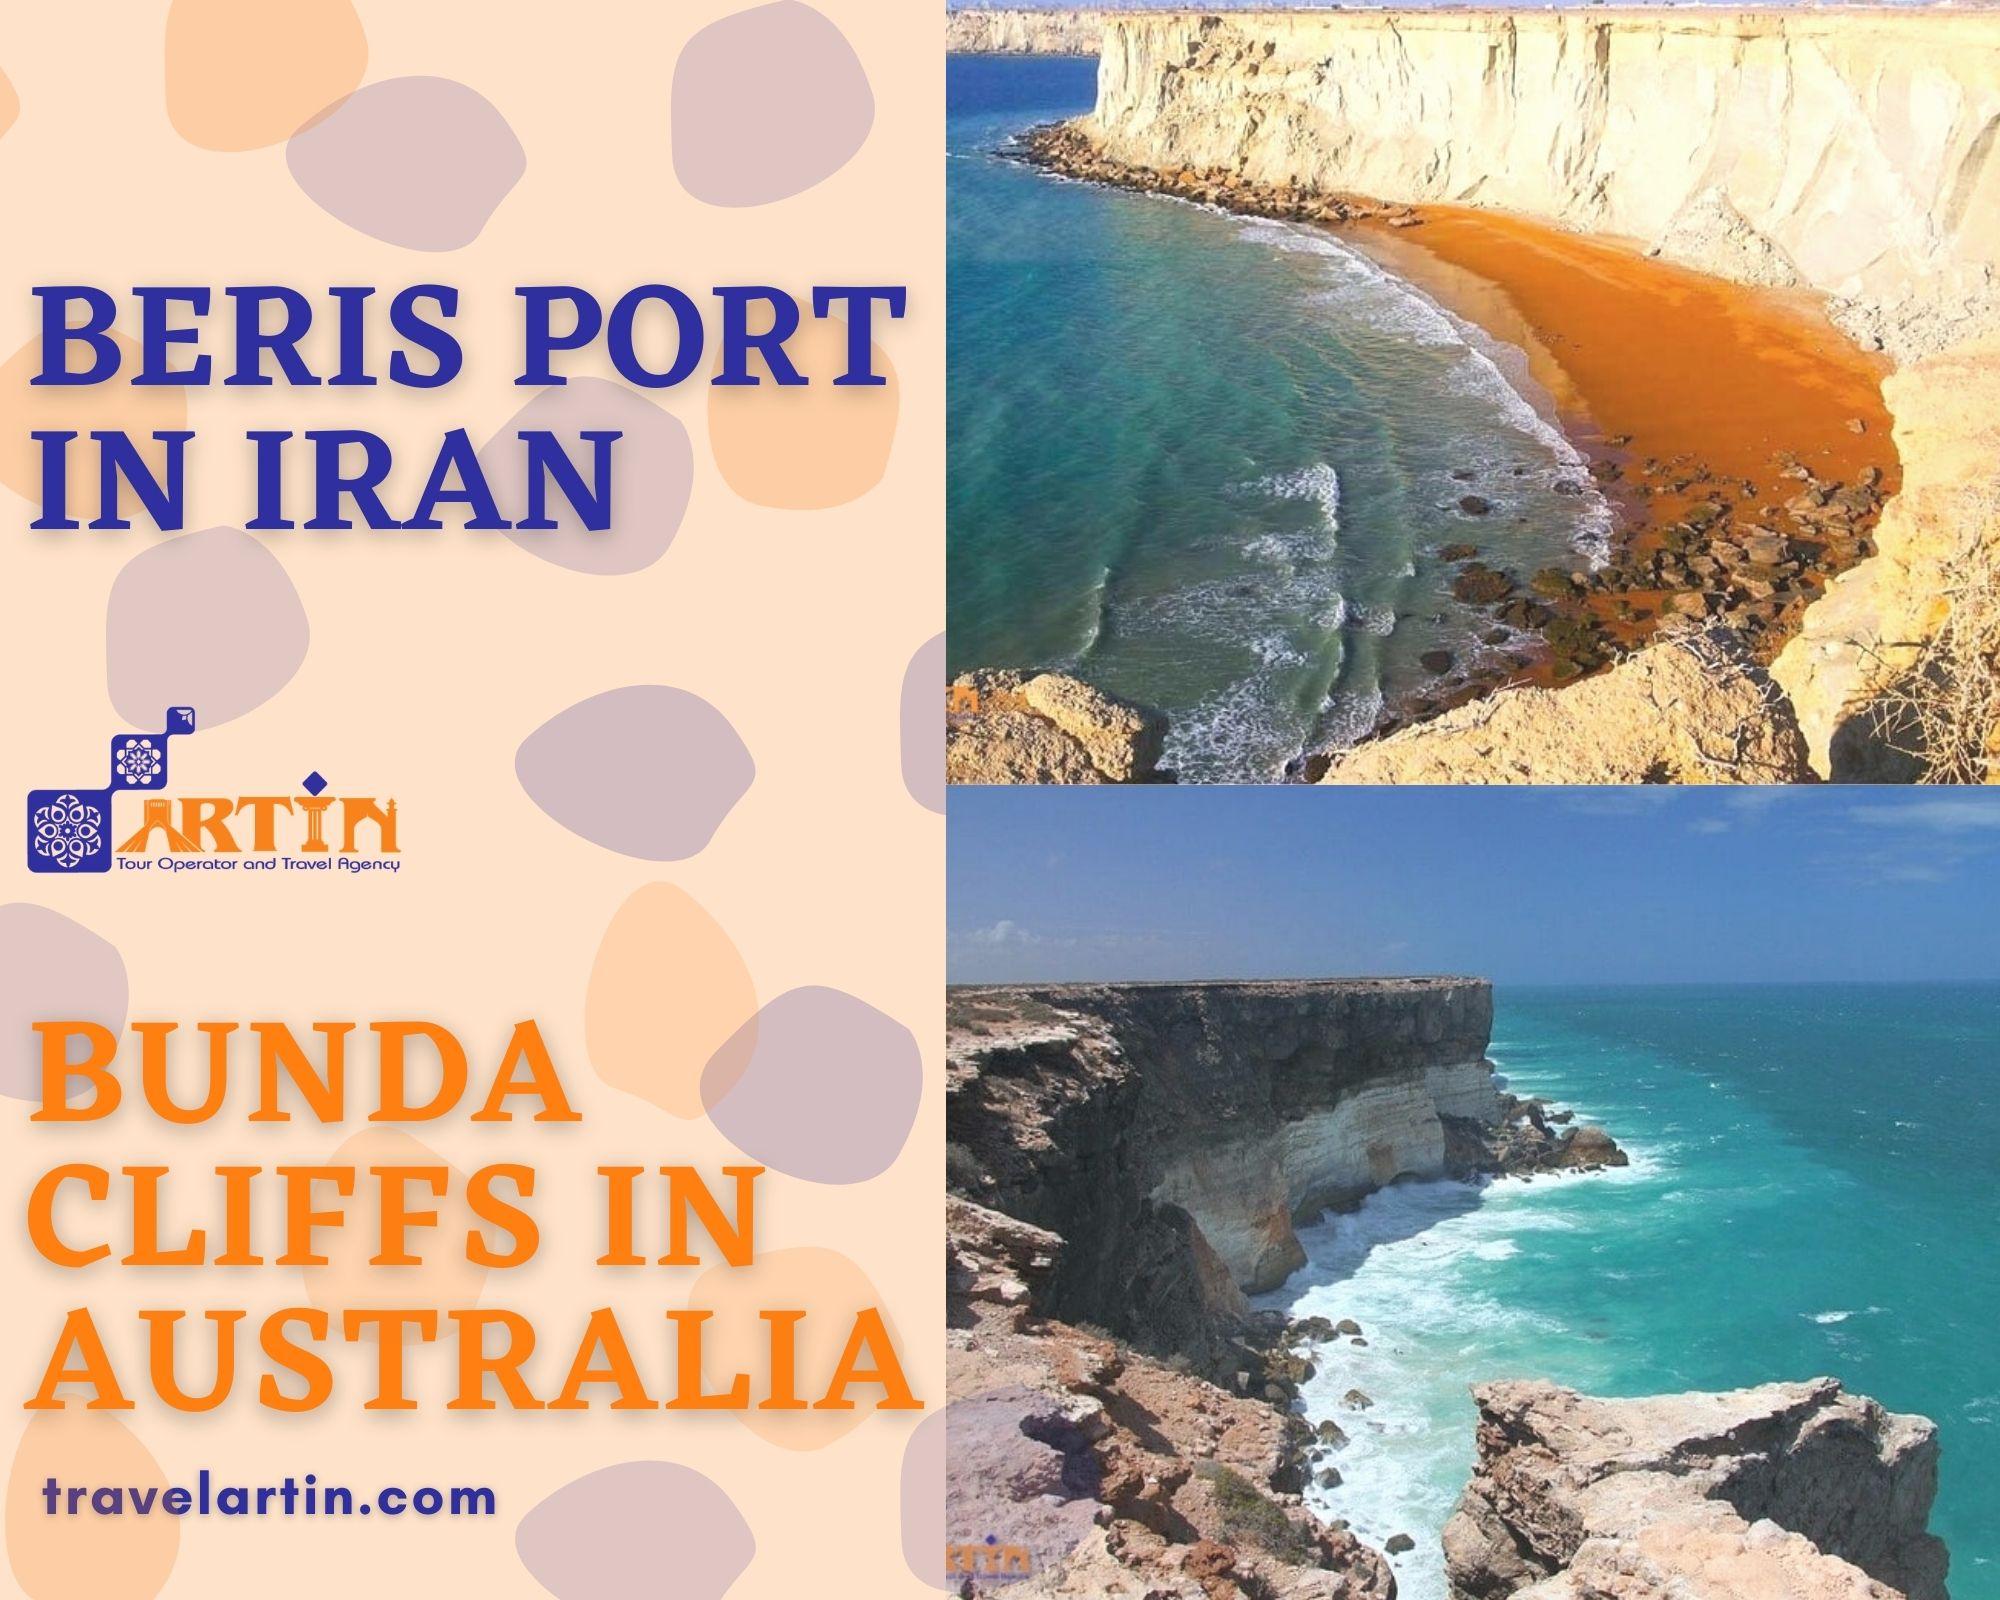 Beris port in Iran and Bunda cliffs in Australia